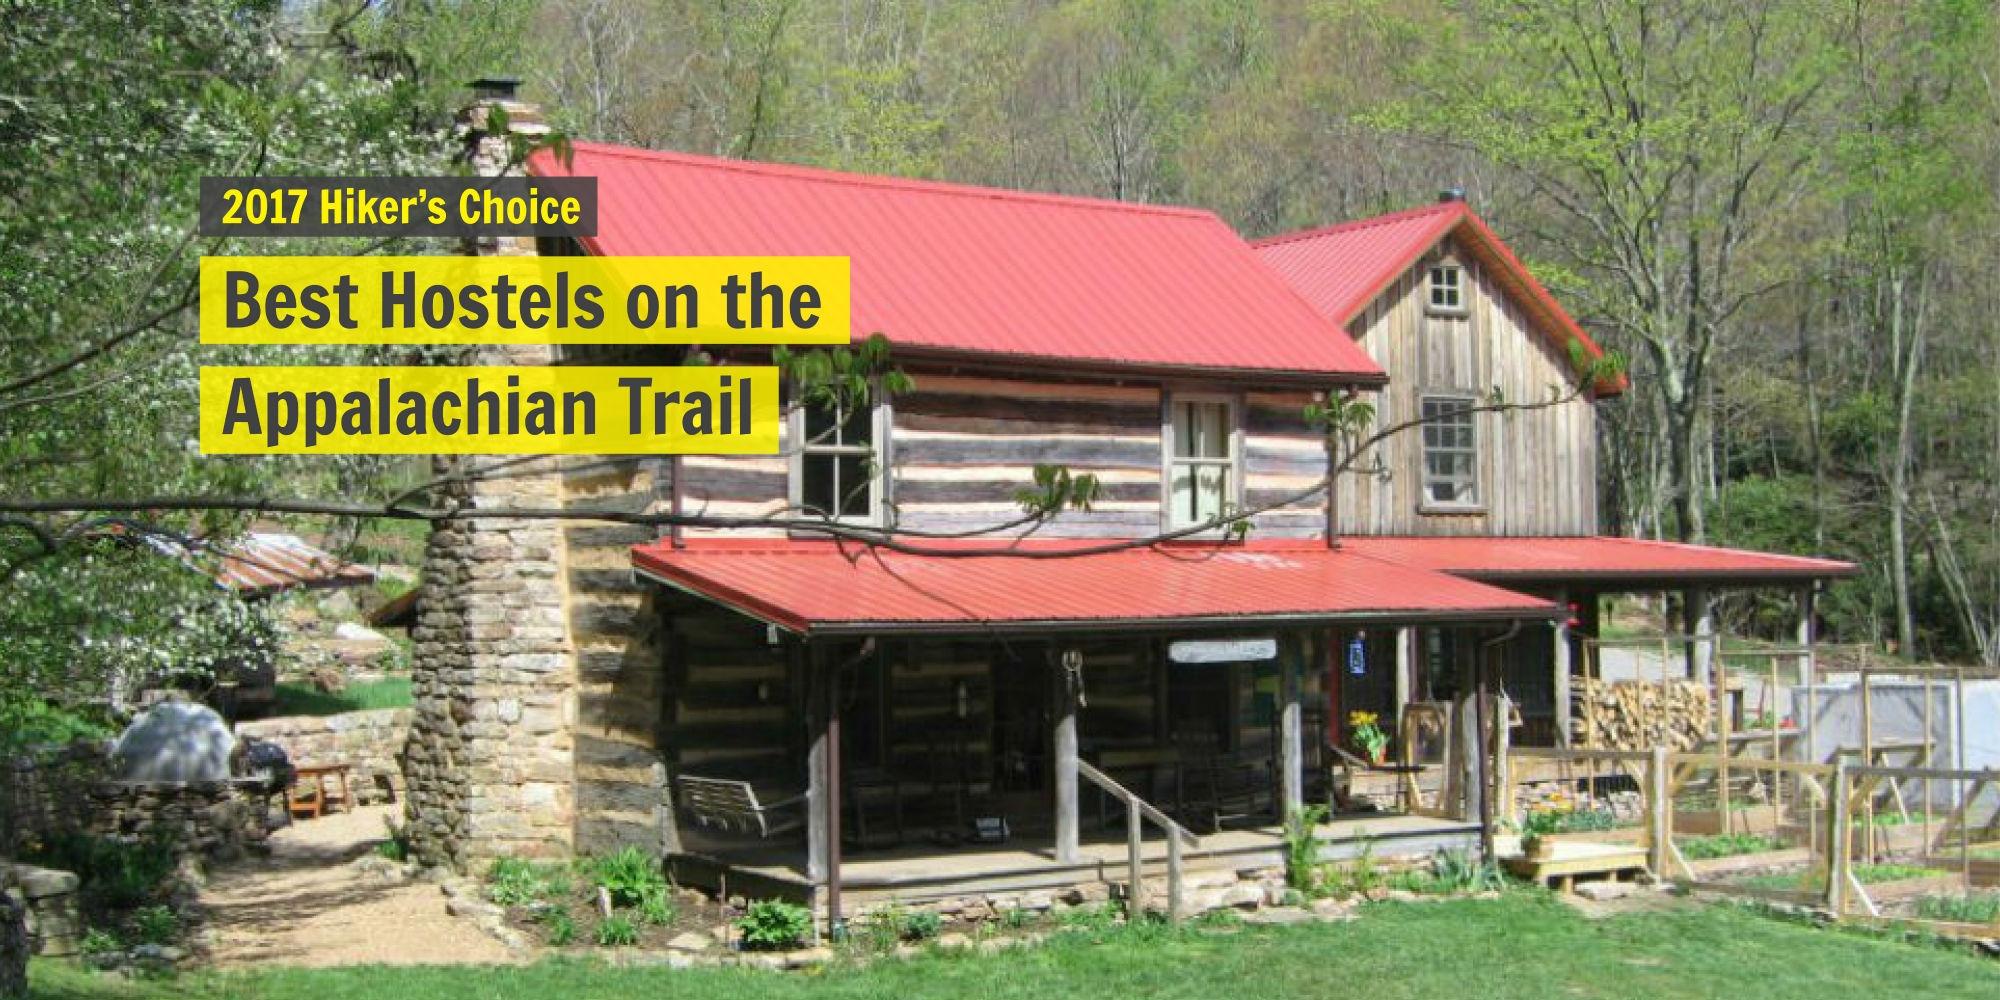 Best Hostels On The Appalachian Trail 2017 Hiker S Choice The Trek